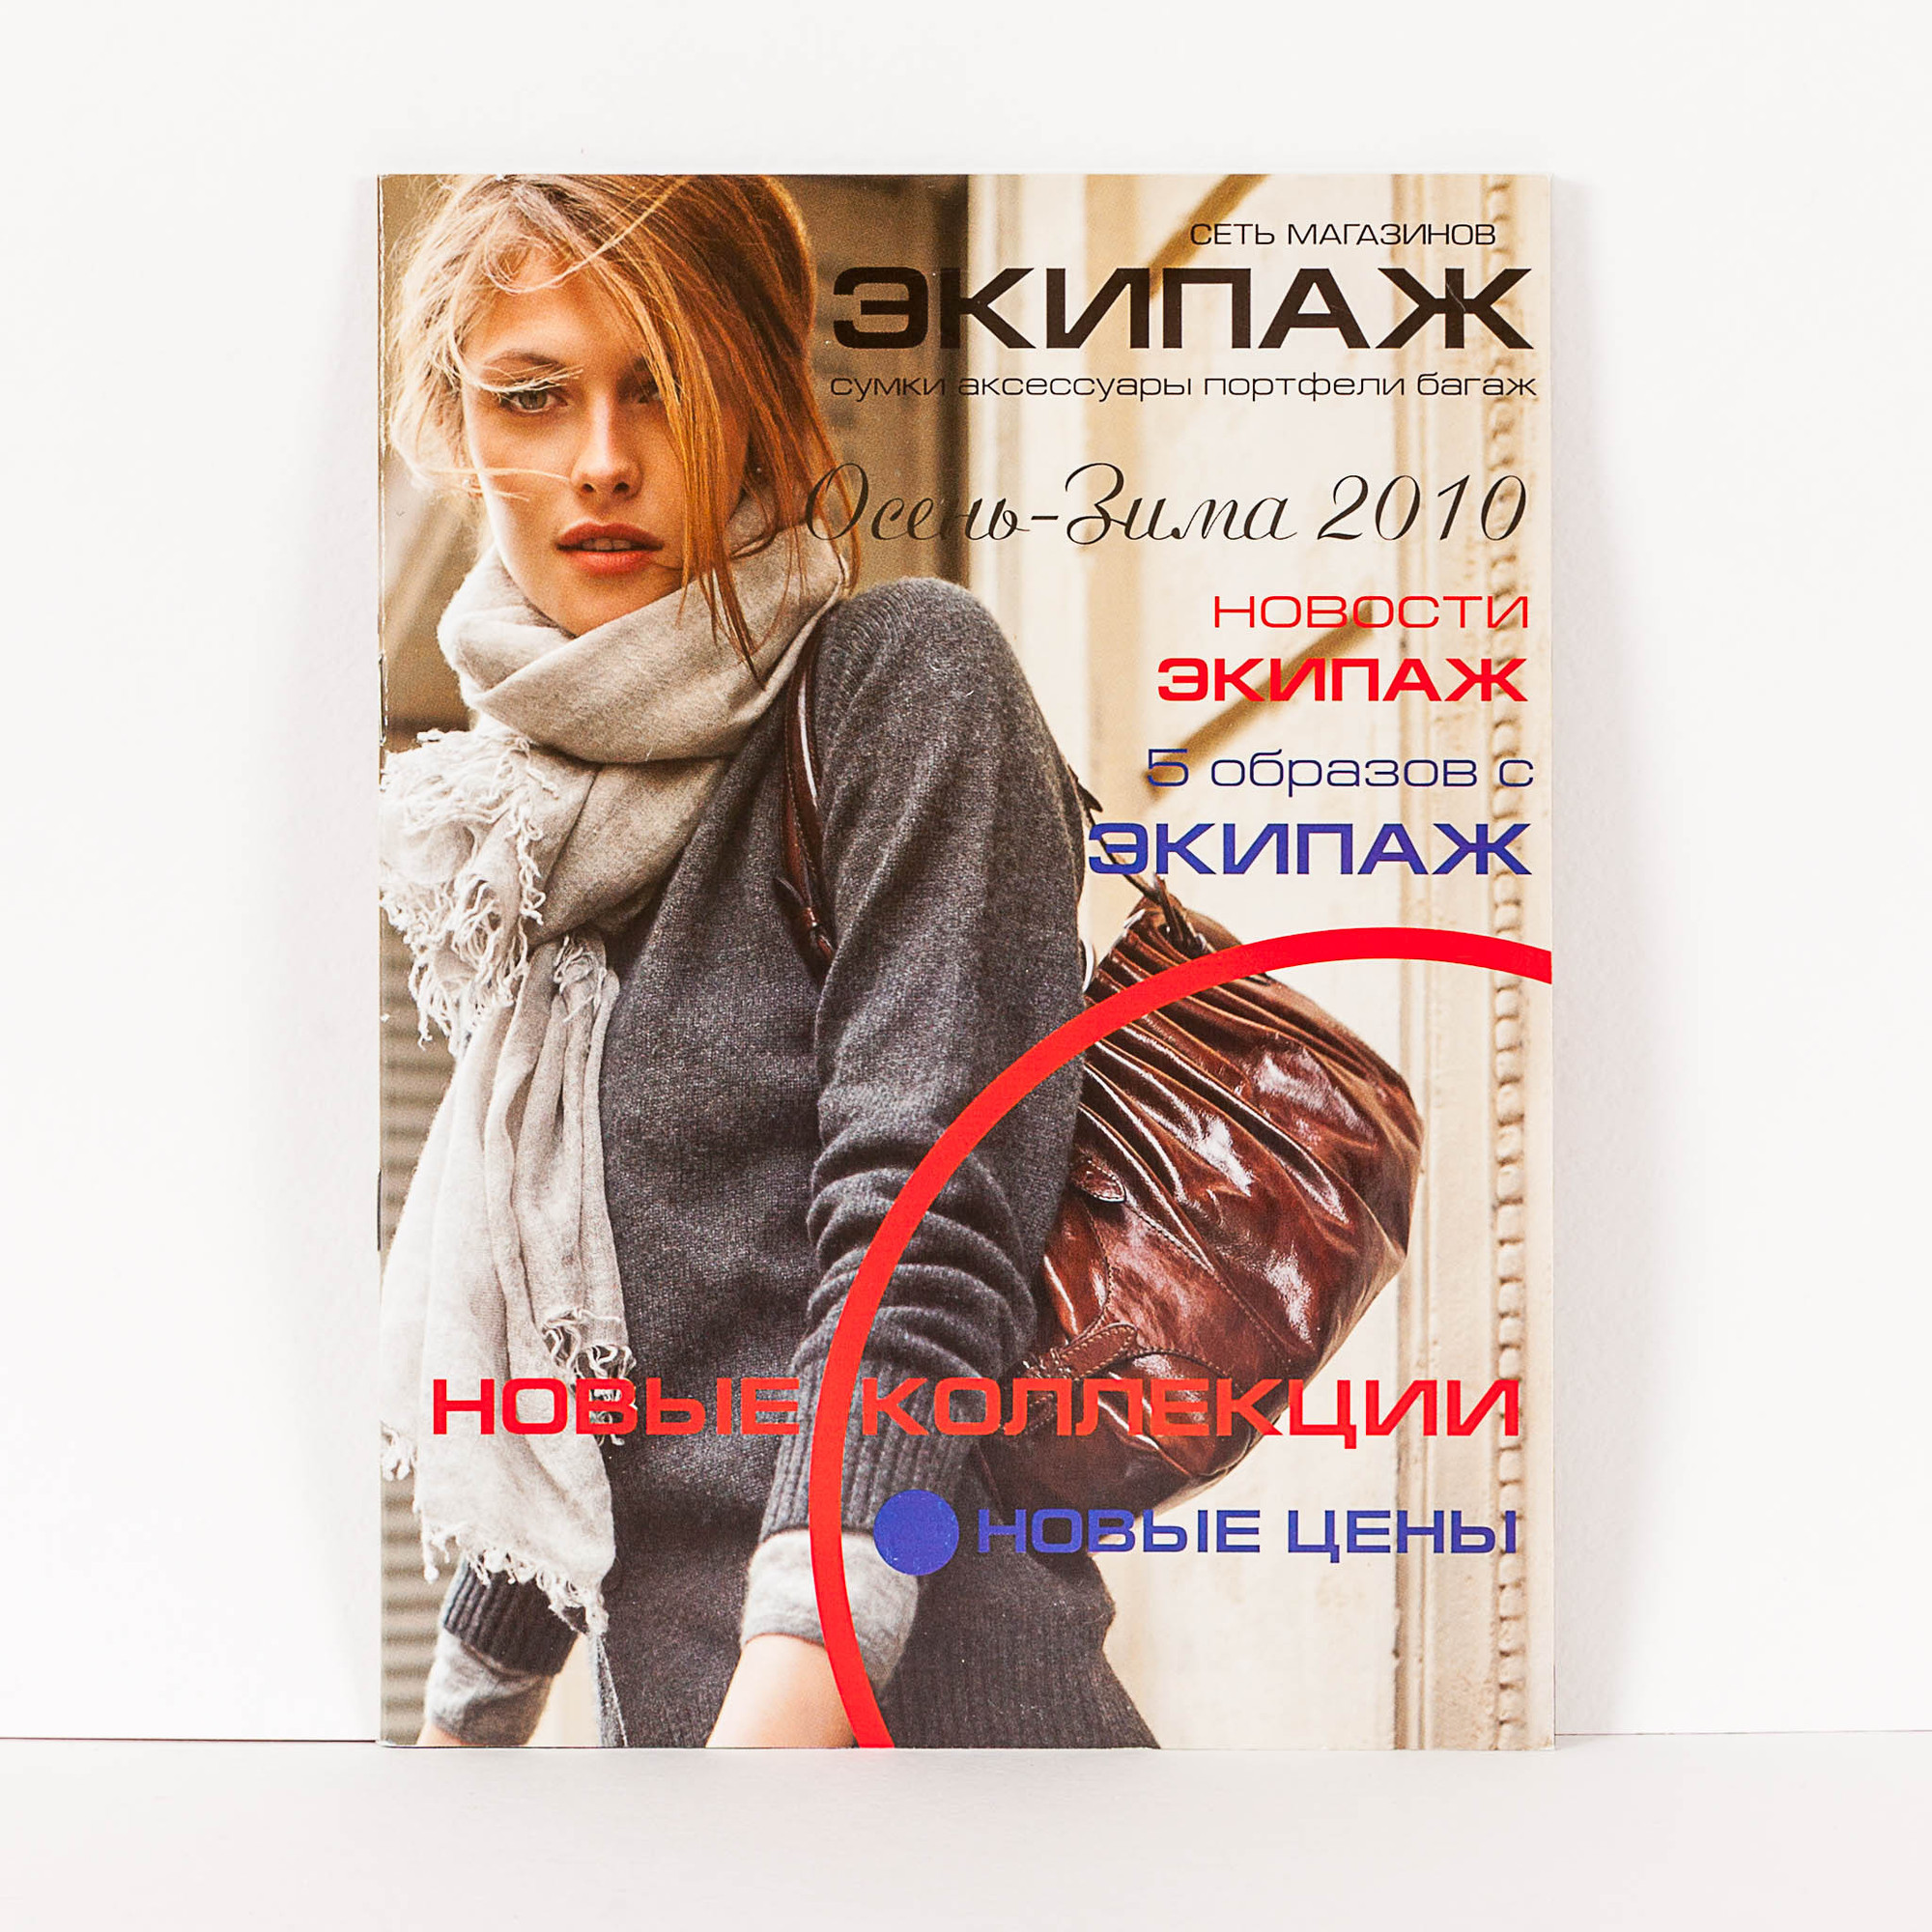 Журнал-каталог Экипаж осень-зима